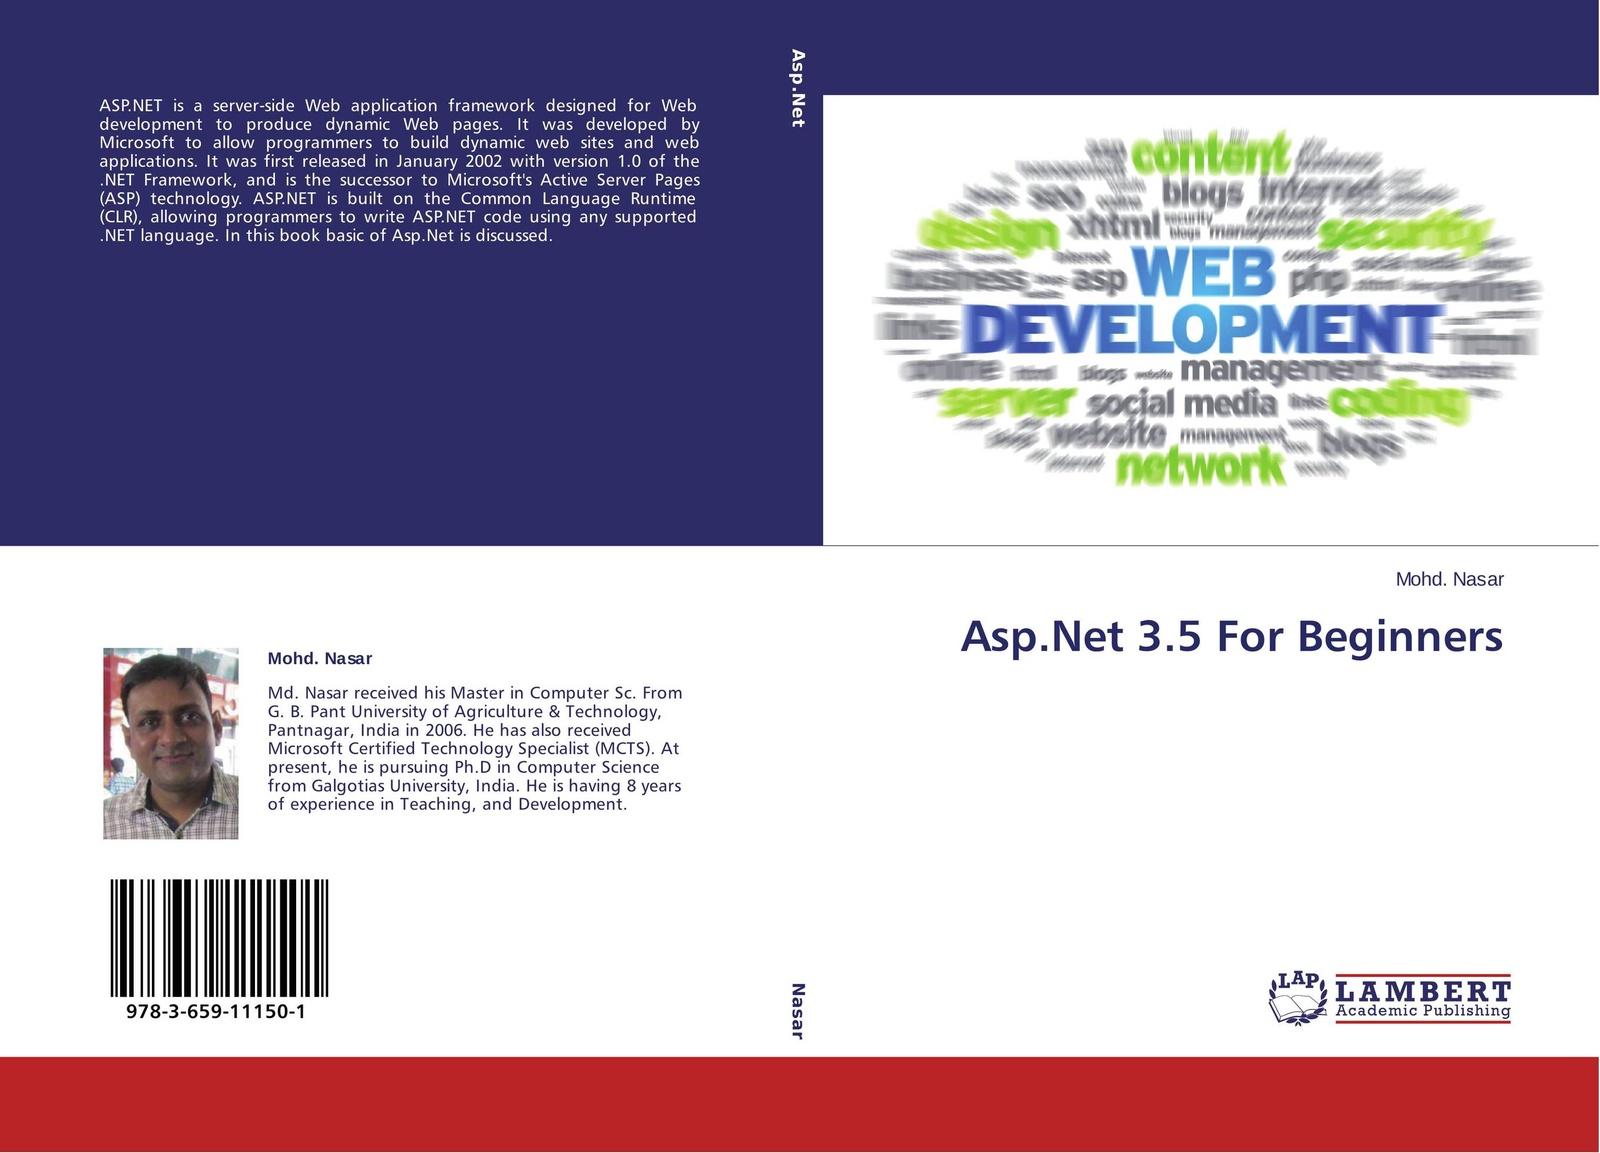 Mohd. Nasar Asp.Net 3.5 For Beginners gil fink ido flatow pro single page application development using backbone js and asp net